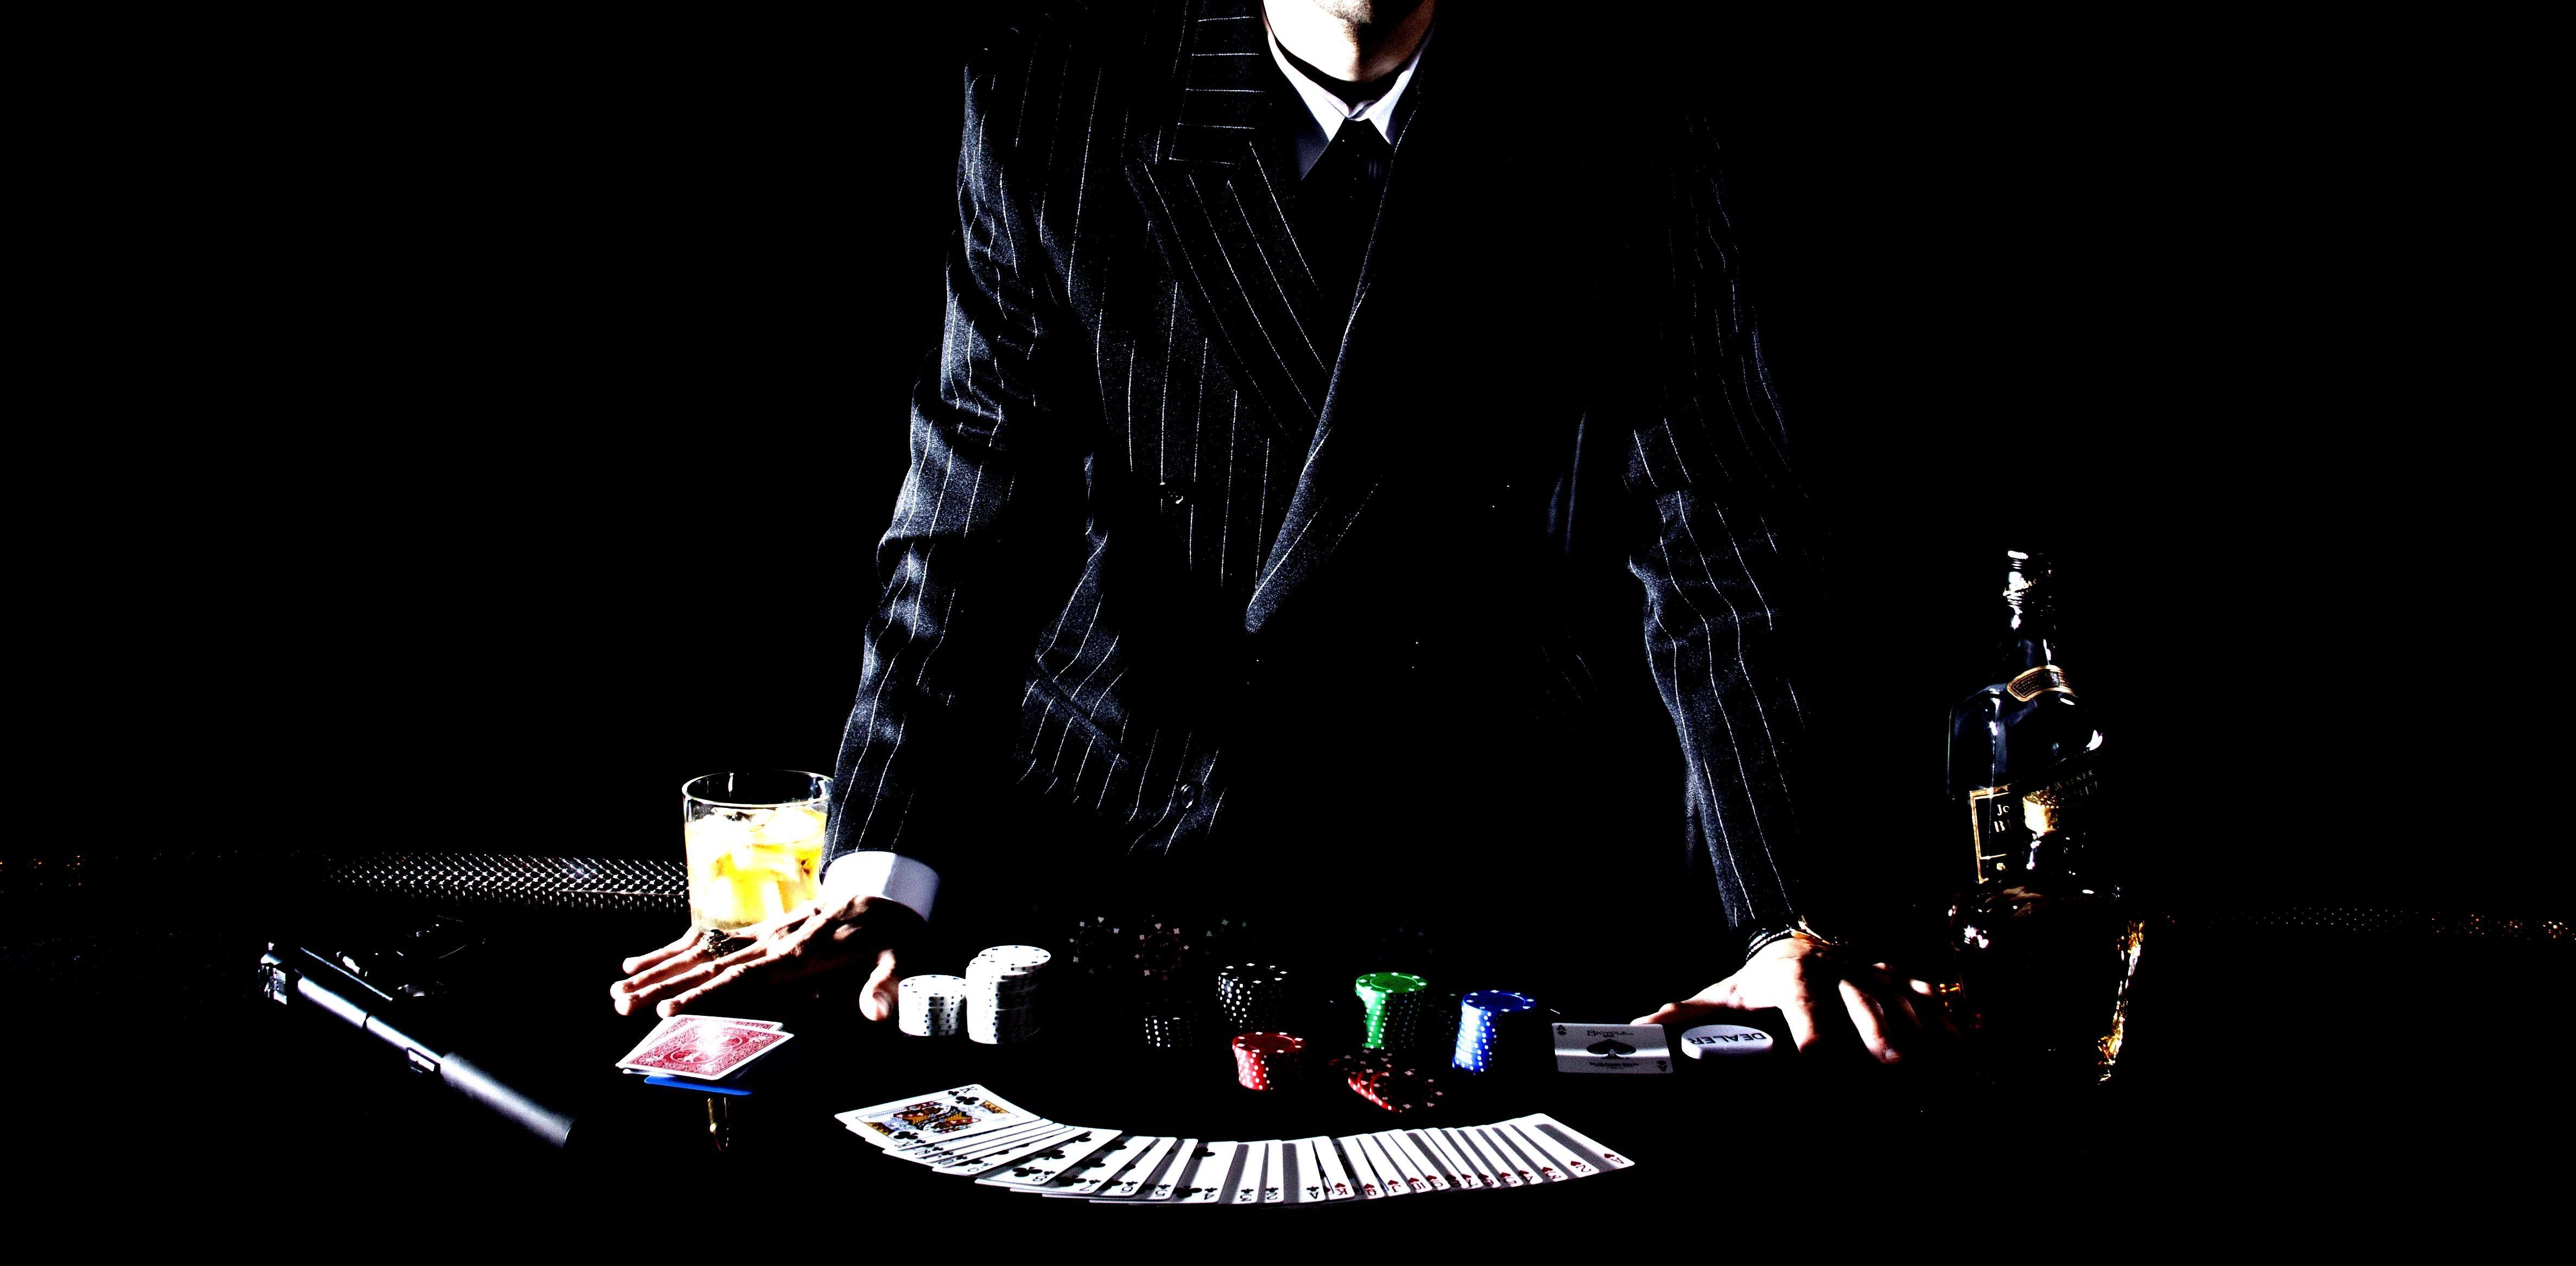 Poker Wallpaper Hd Free Download Hd Wallpapers Pinterest Poker Wallpaper And Hd Wallpaper